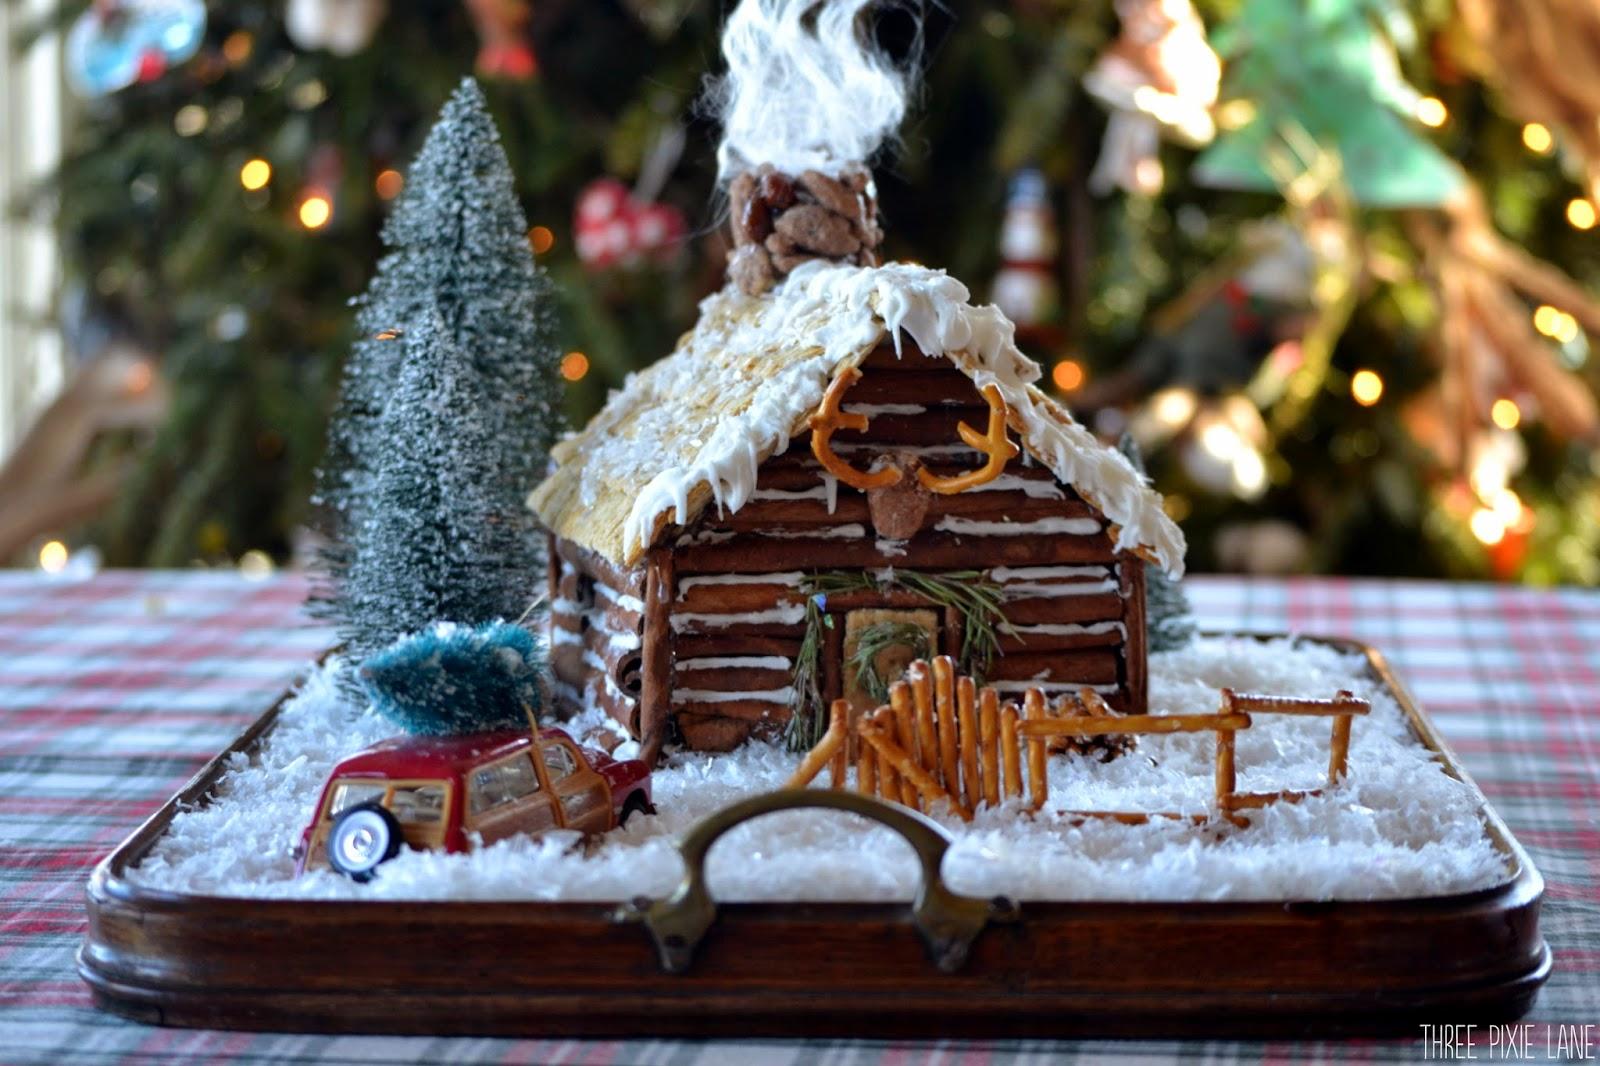 Three Pixie Lane Gingerbread Log Cabin